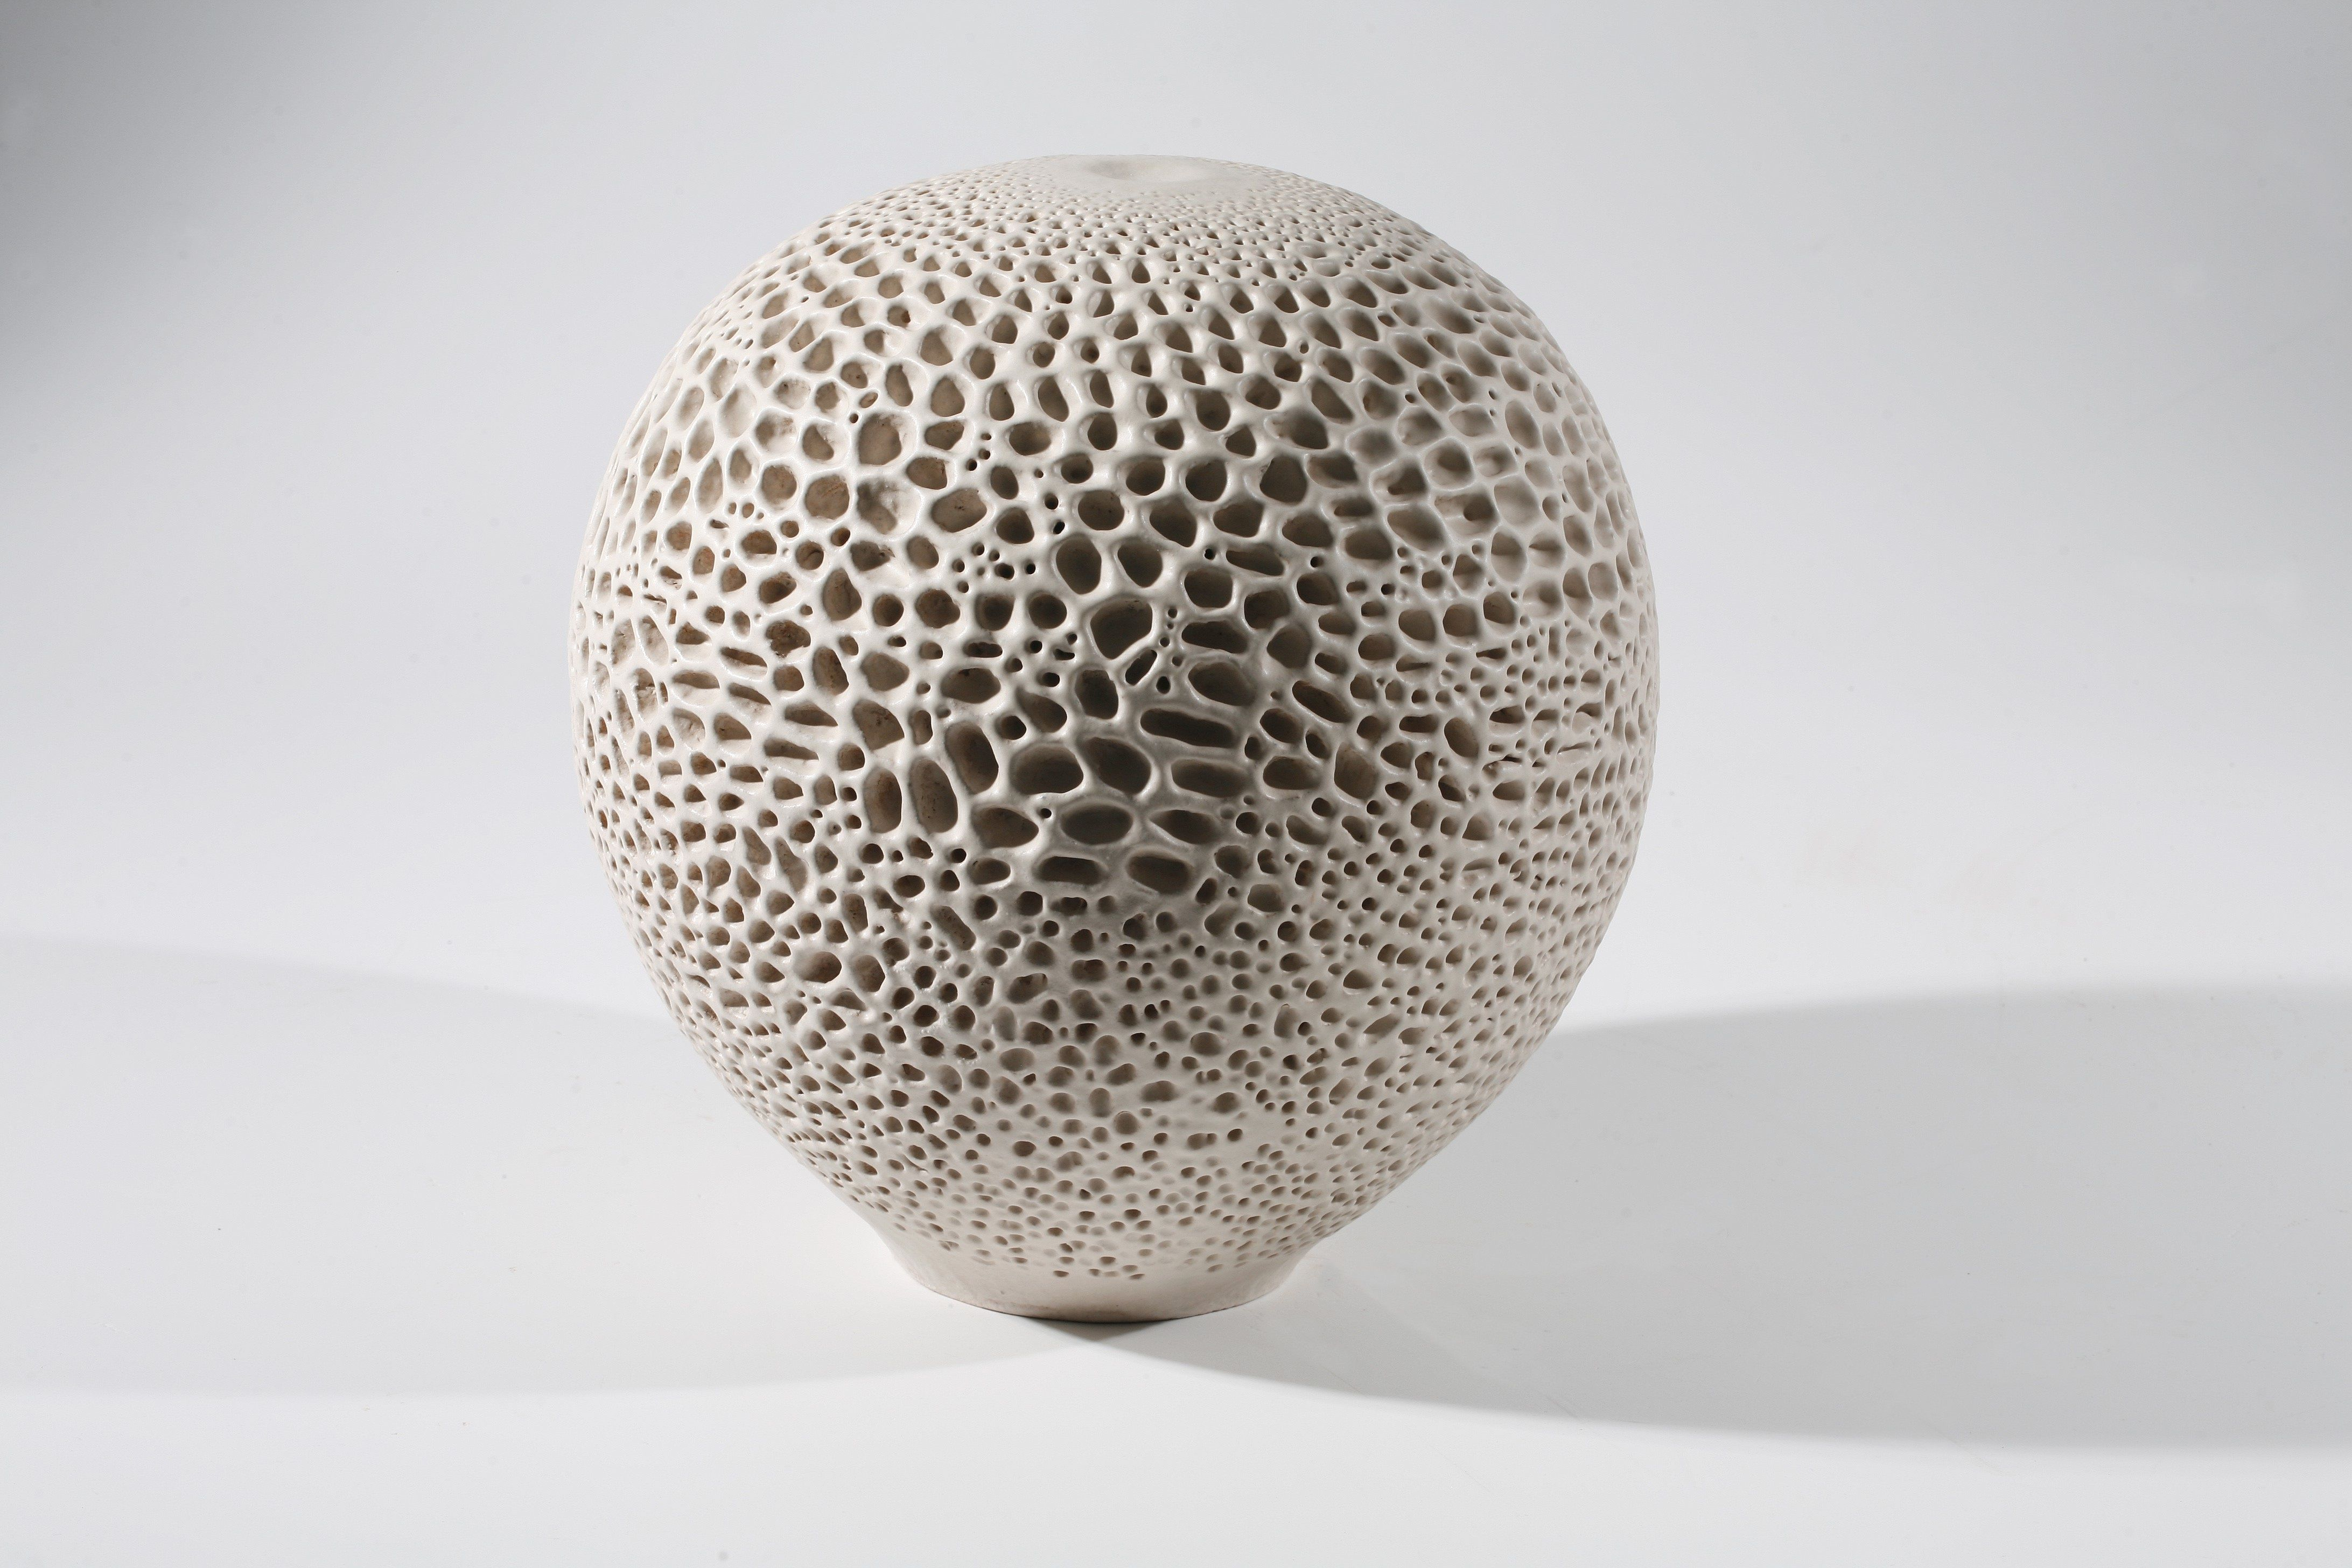 Ceramic Form 3 Zbigniew Wozniak Natural Forms Ceramics Interesting Things